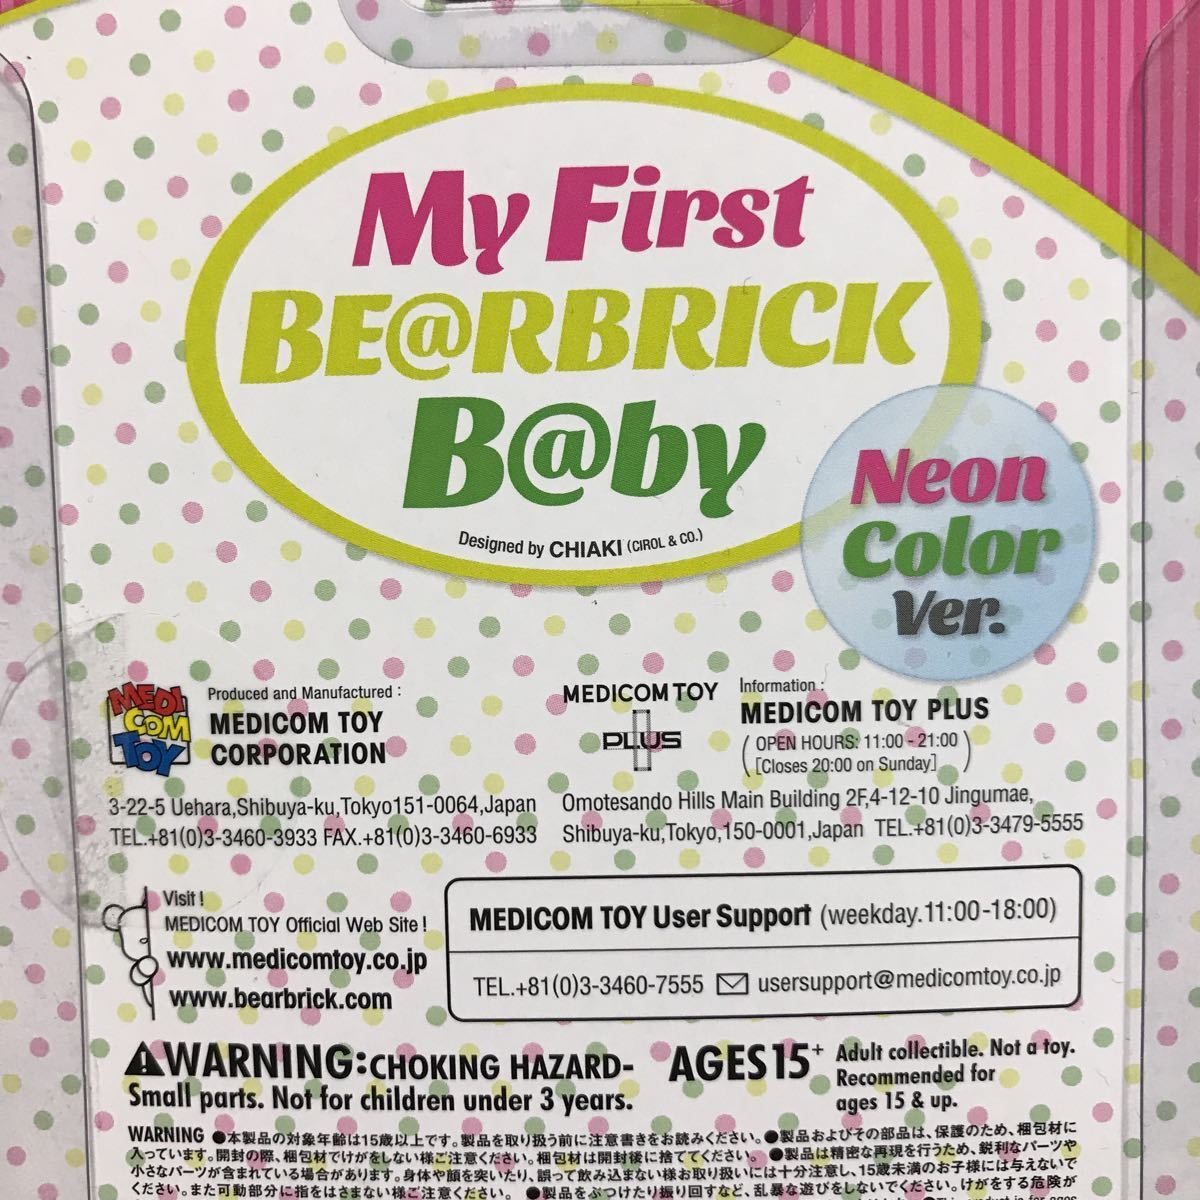 MEDICOM TOY MY FIRST BE@RBRICK B@BY NEON COLOR Ver. 100% 千秋 CHIAKI メディコムトイ ベアブリック _画像5